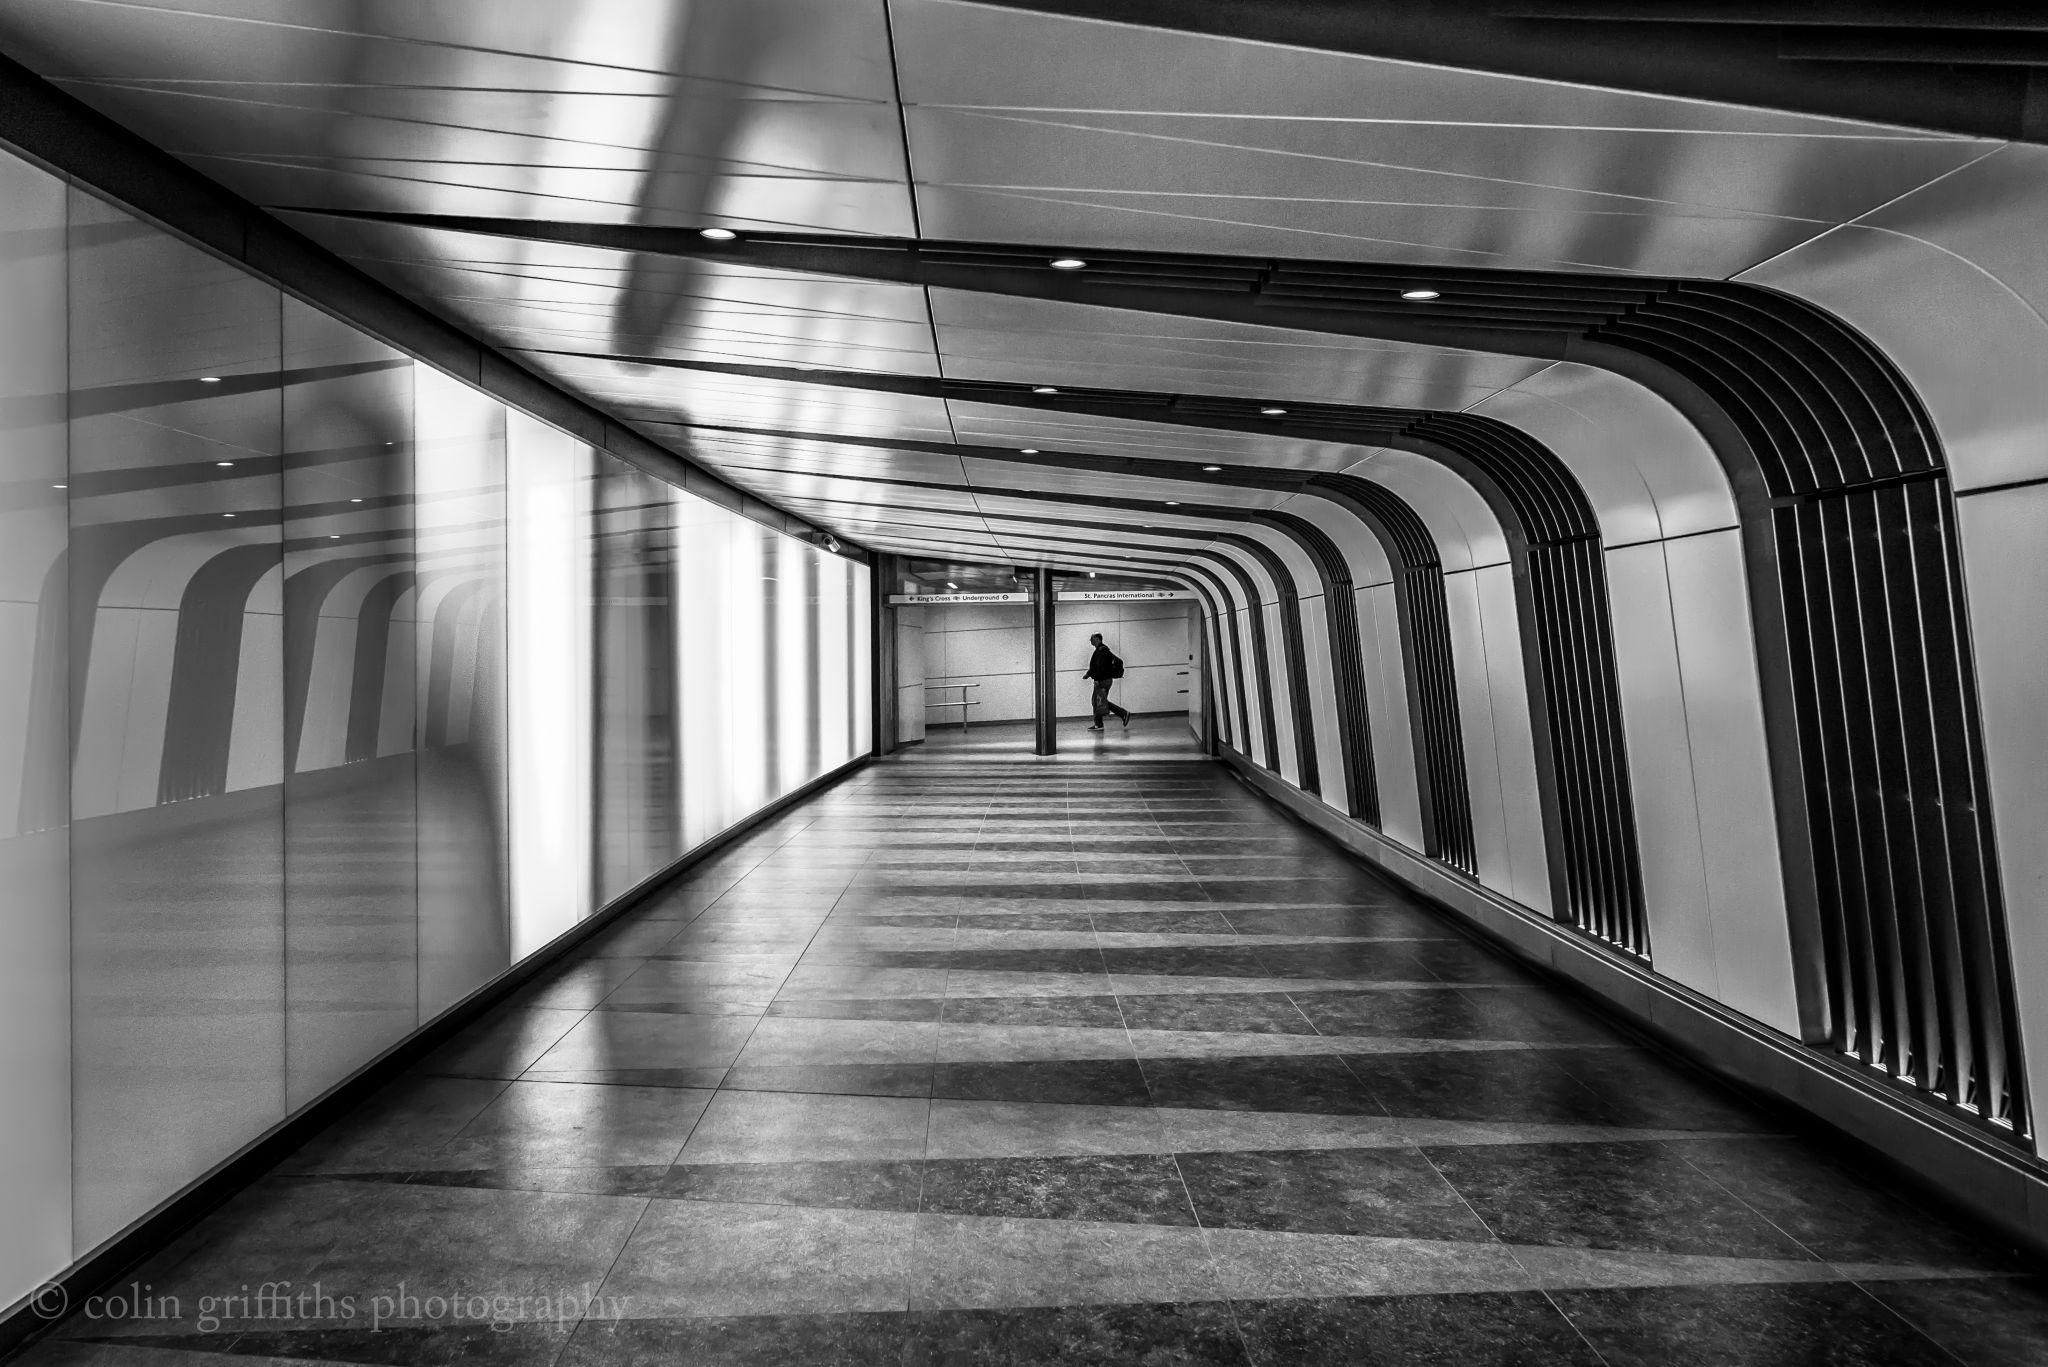 Station passageway, United Kingdom